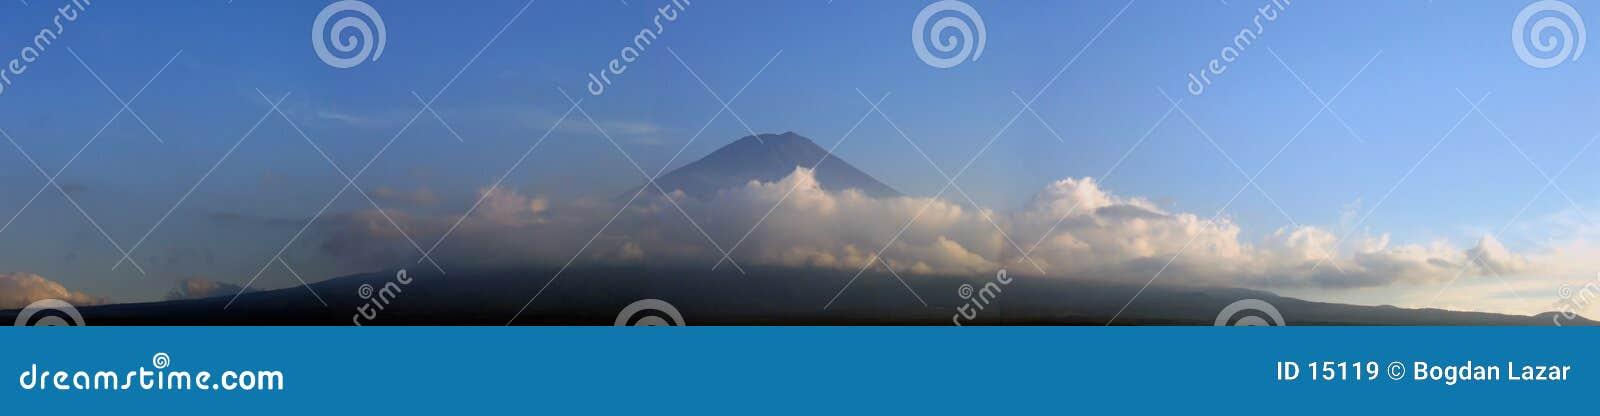 Montierung Fuji umgeben durch Wolken - Panorama